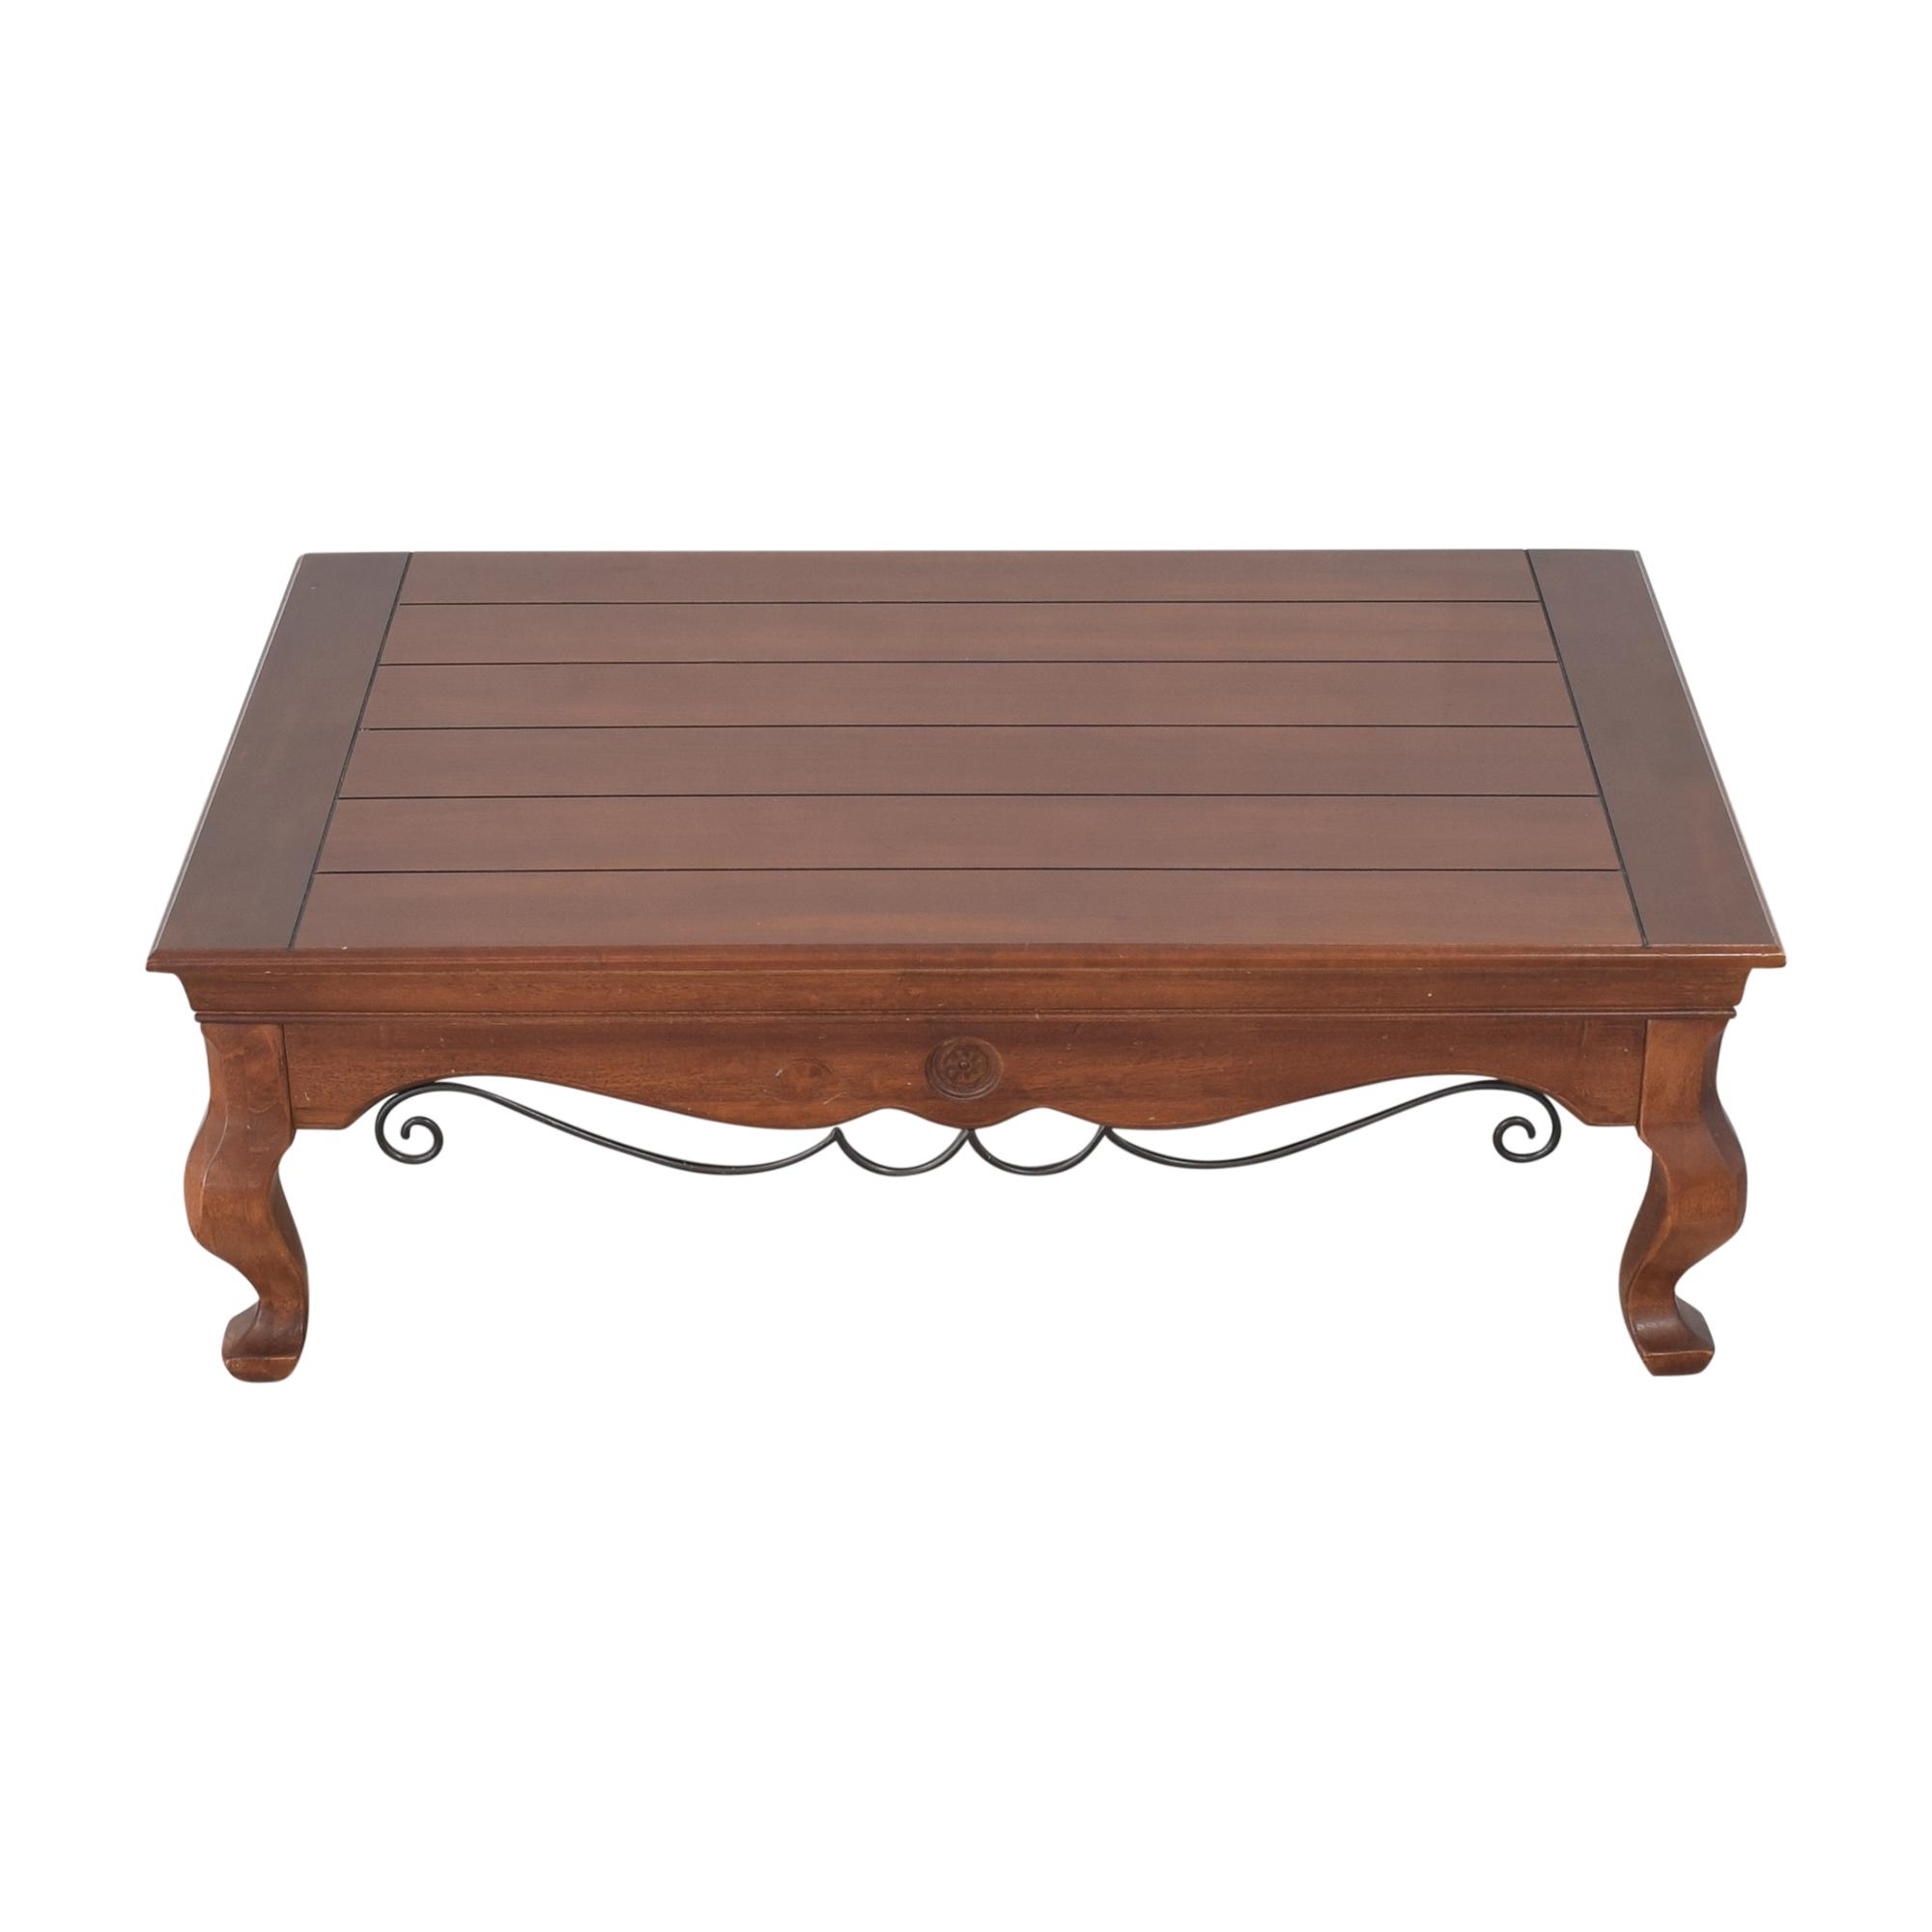 Rectangular Coffee Table / Coffee Tables